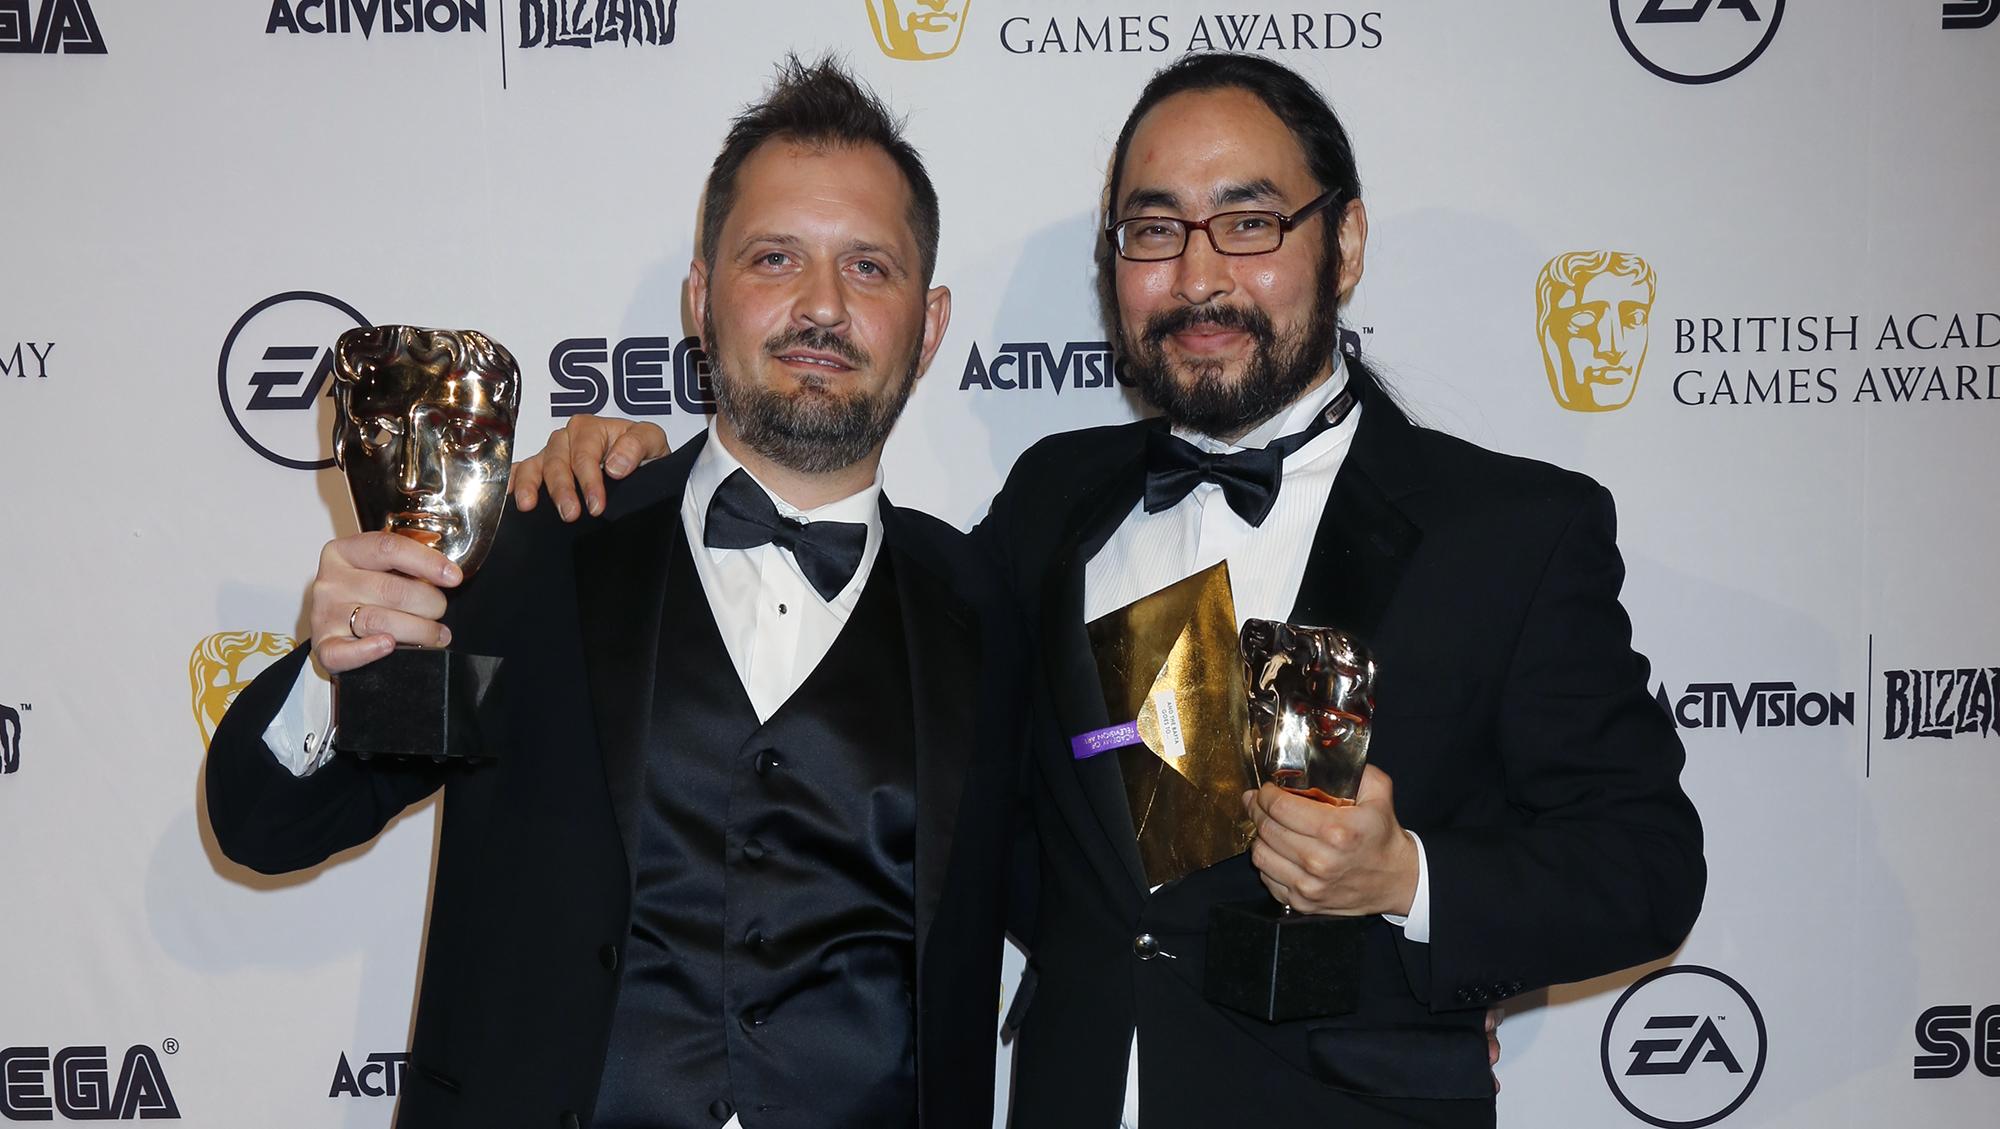 Art Director Dima Veryovka and Lead Writer Ishmael Hope